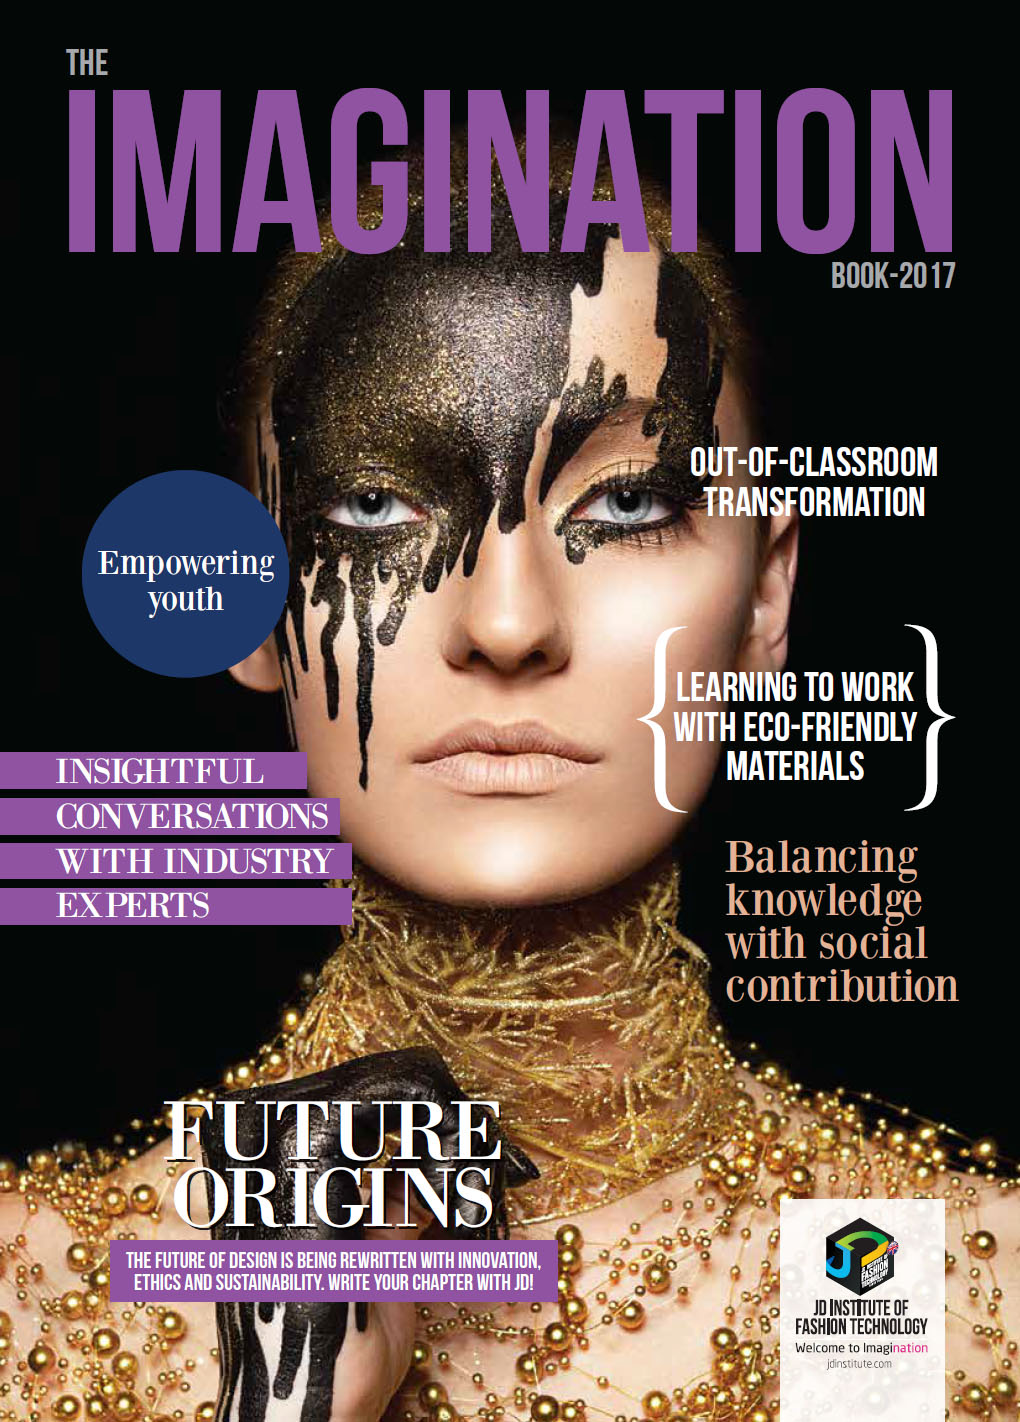 best college for fashion designing Imagination Books Imagination Book 2017 Cover